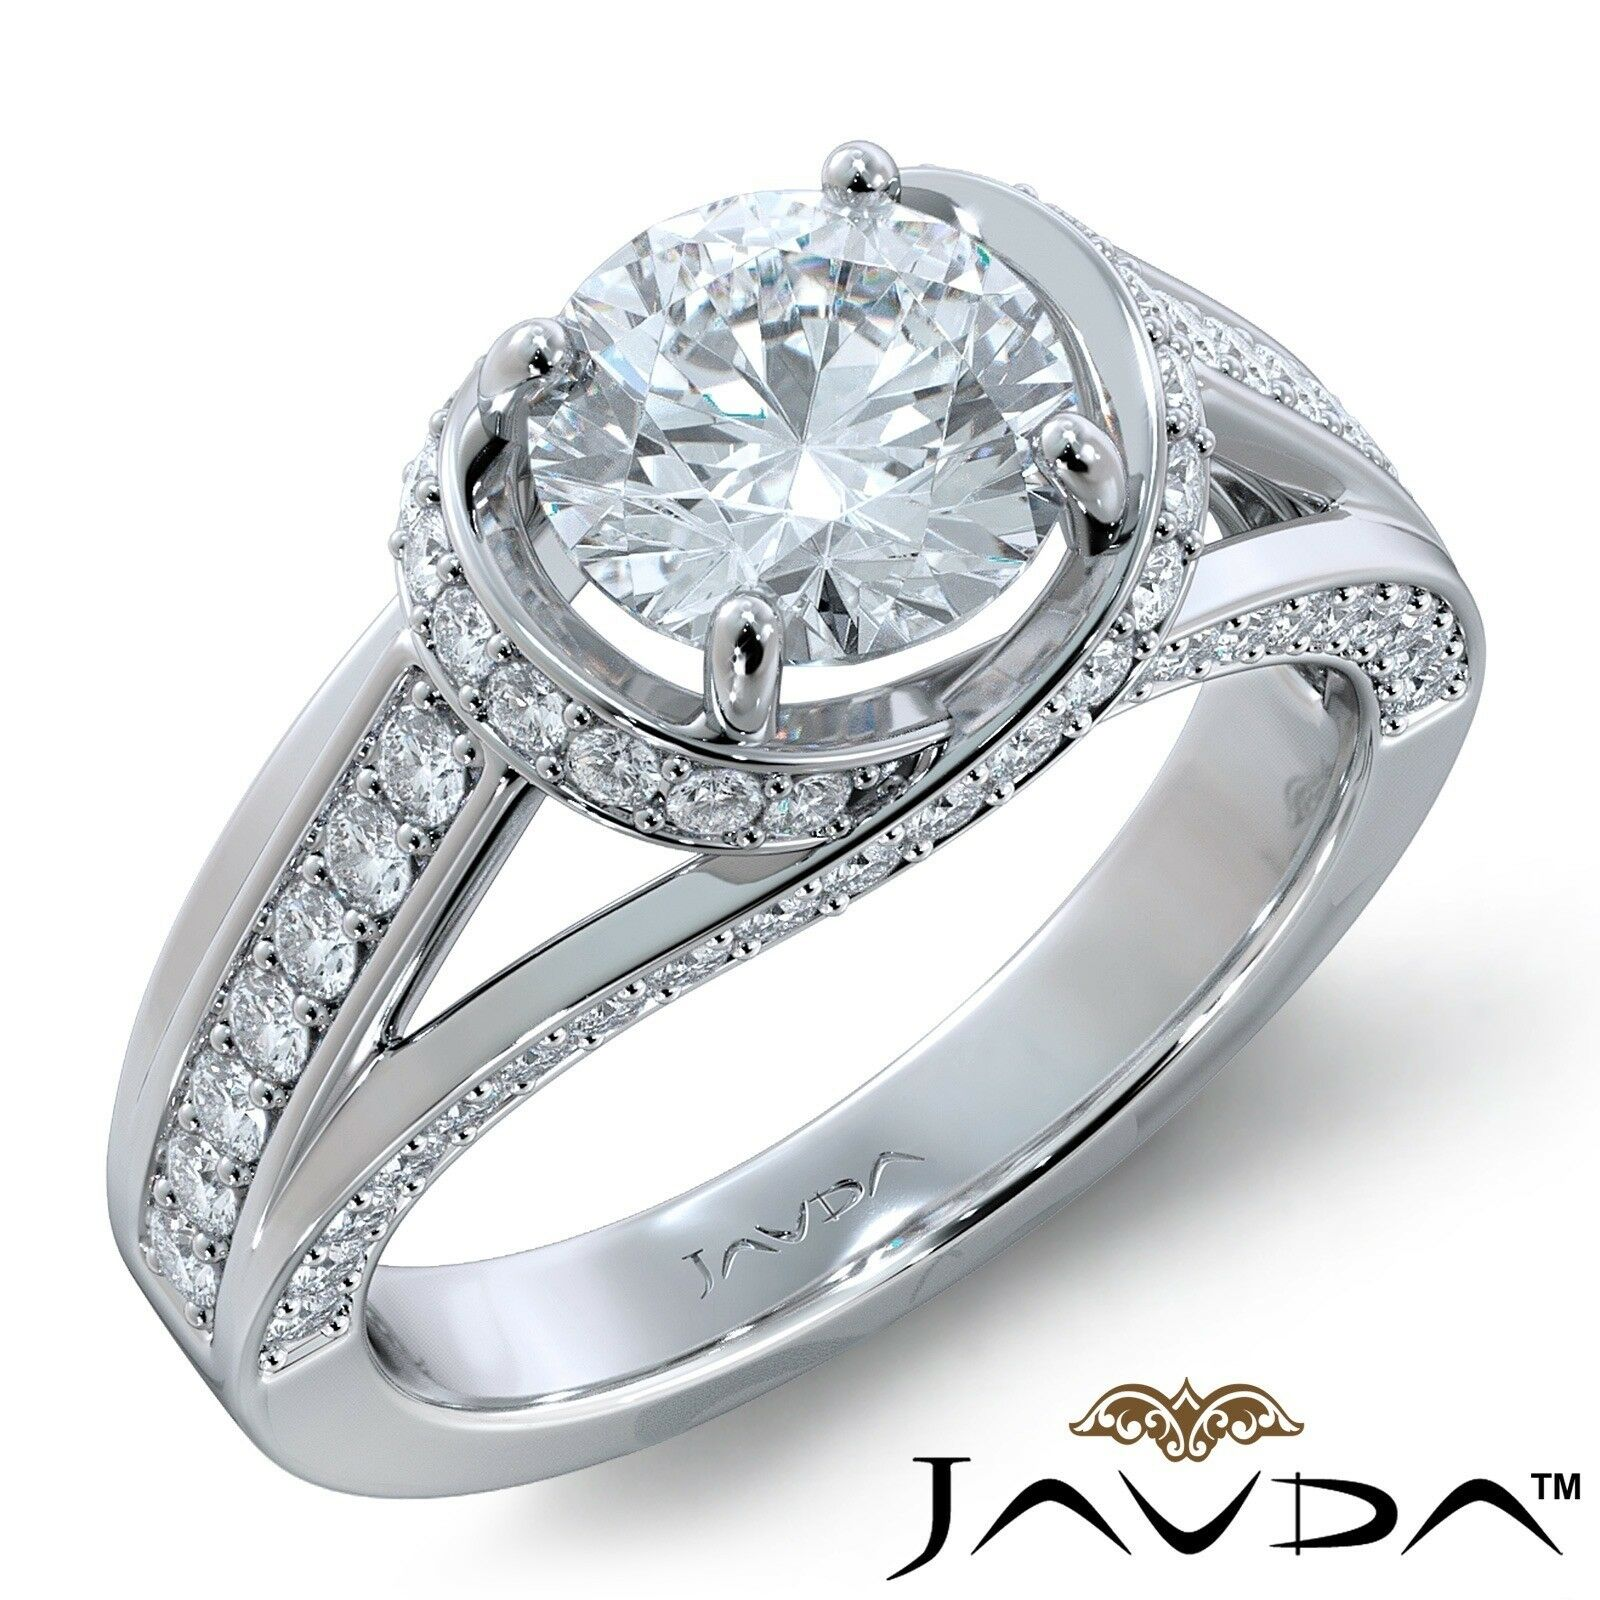 2.71ctw Knot Classic Sidestone Round Diamond Engagement Ring GIA F-VVS1 W Gold